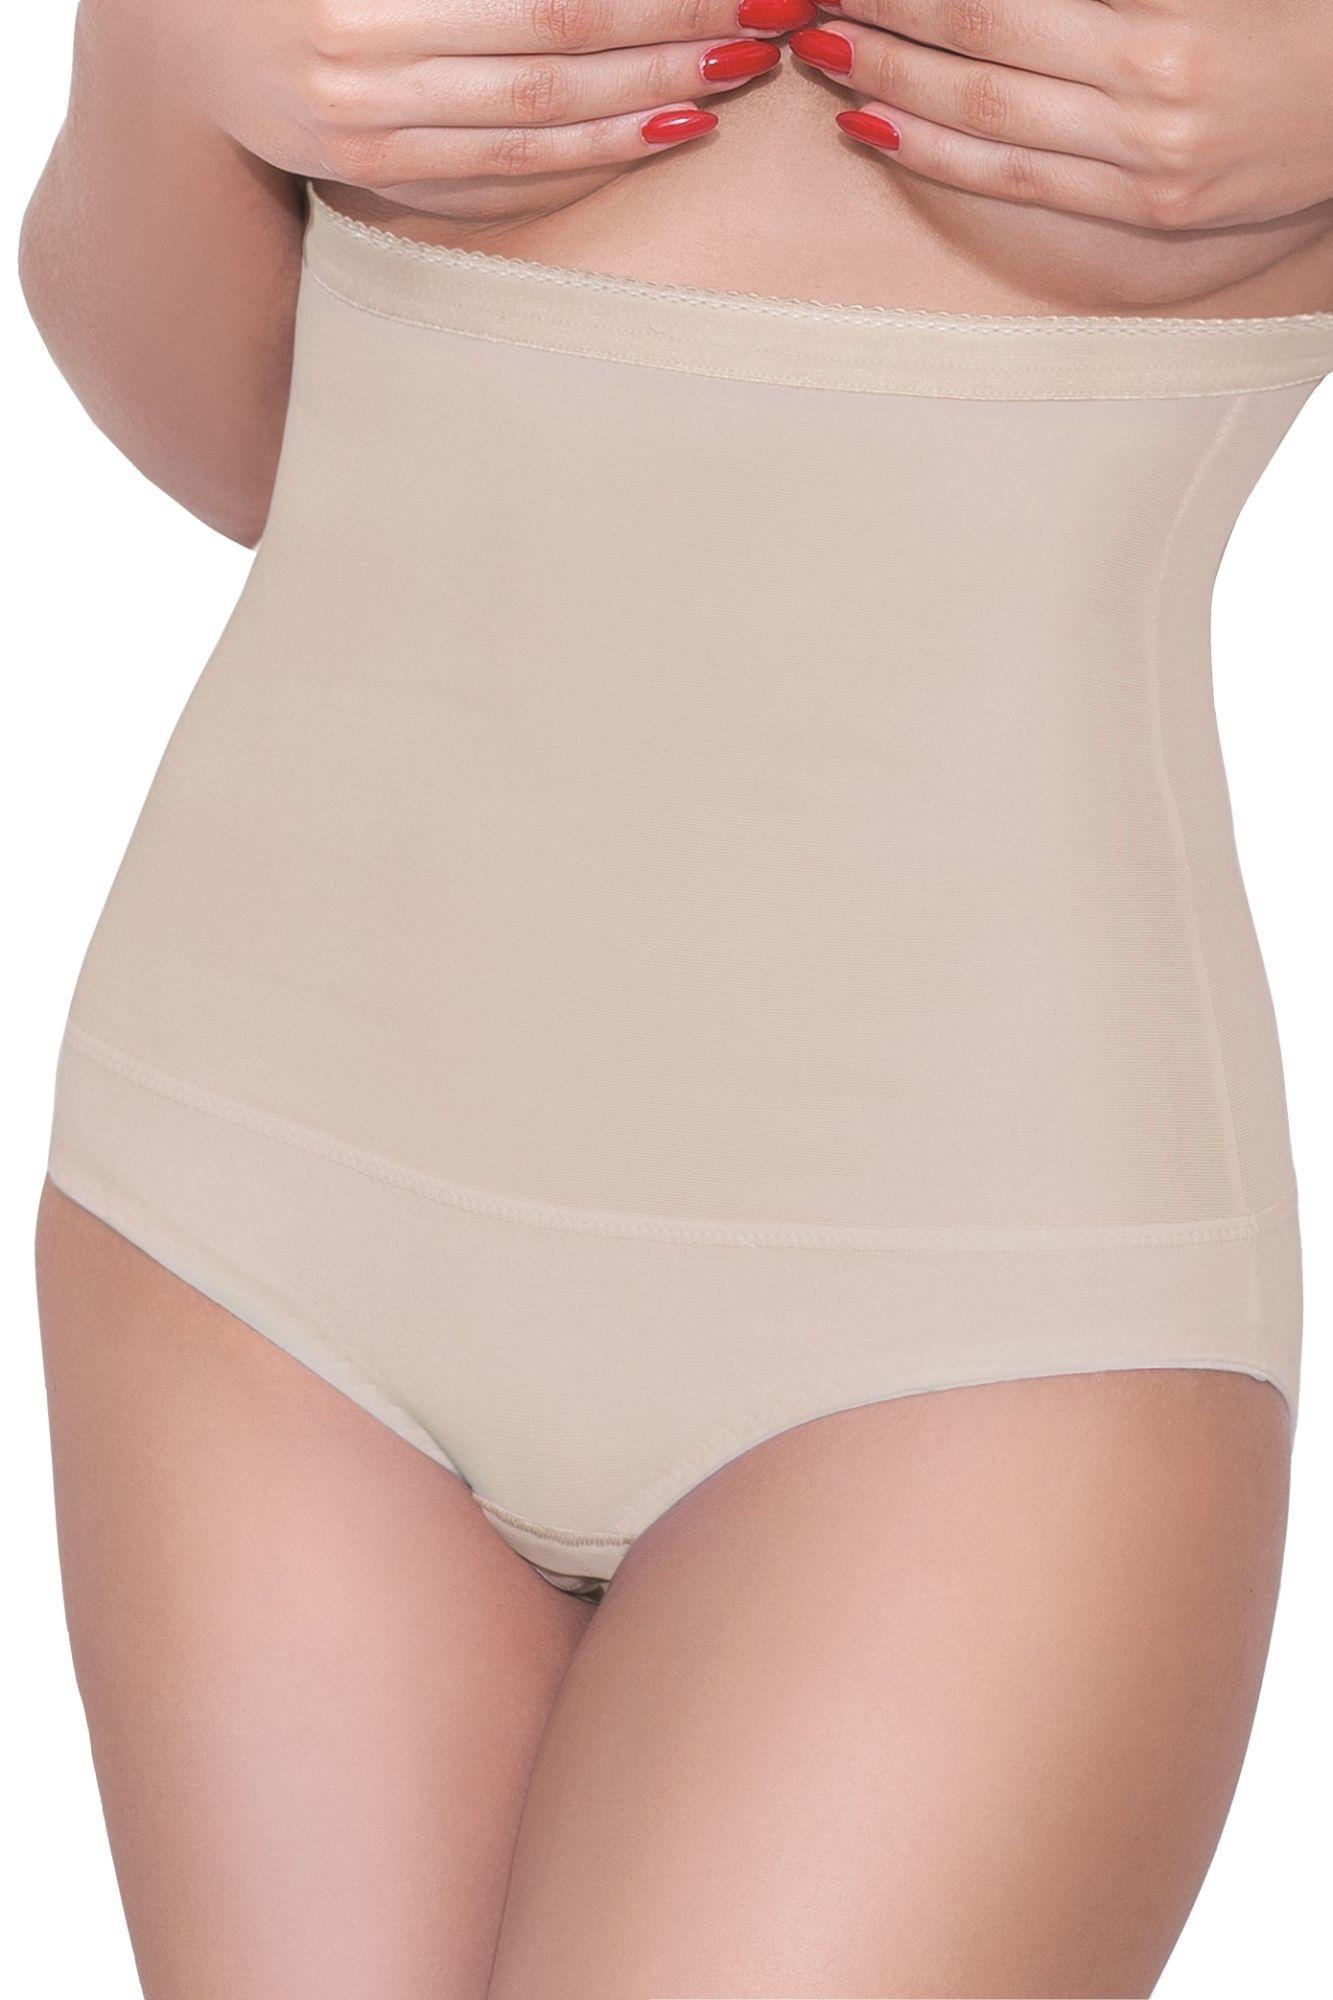 Rozepínací stahovací kalhotky Iga béžové - ELEGANT.cz 5e147a3b71